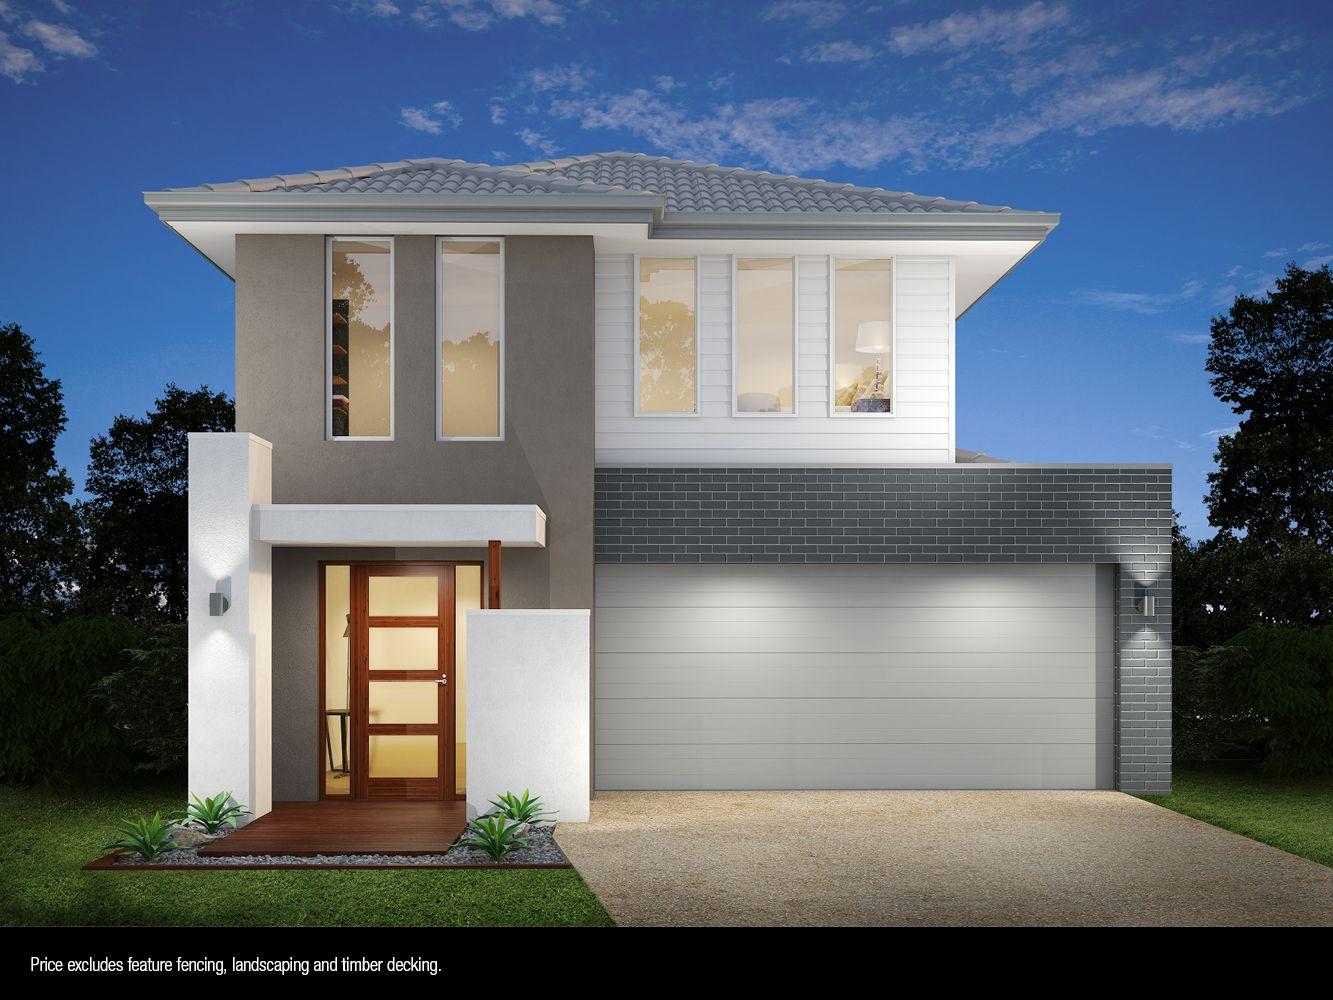 Lot 1439 Brindabella Street, Newport QLD 4020, Image 0